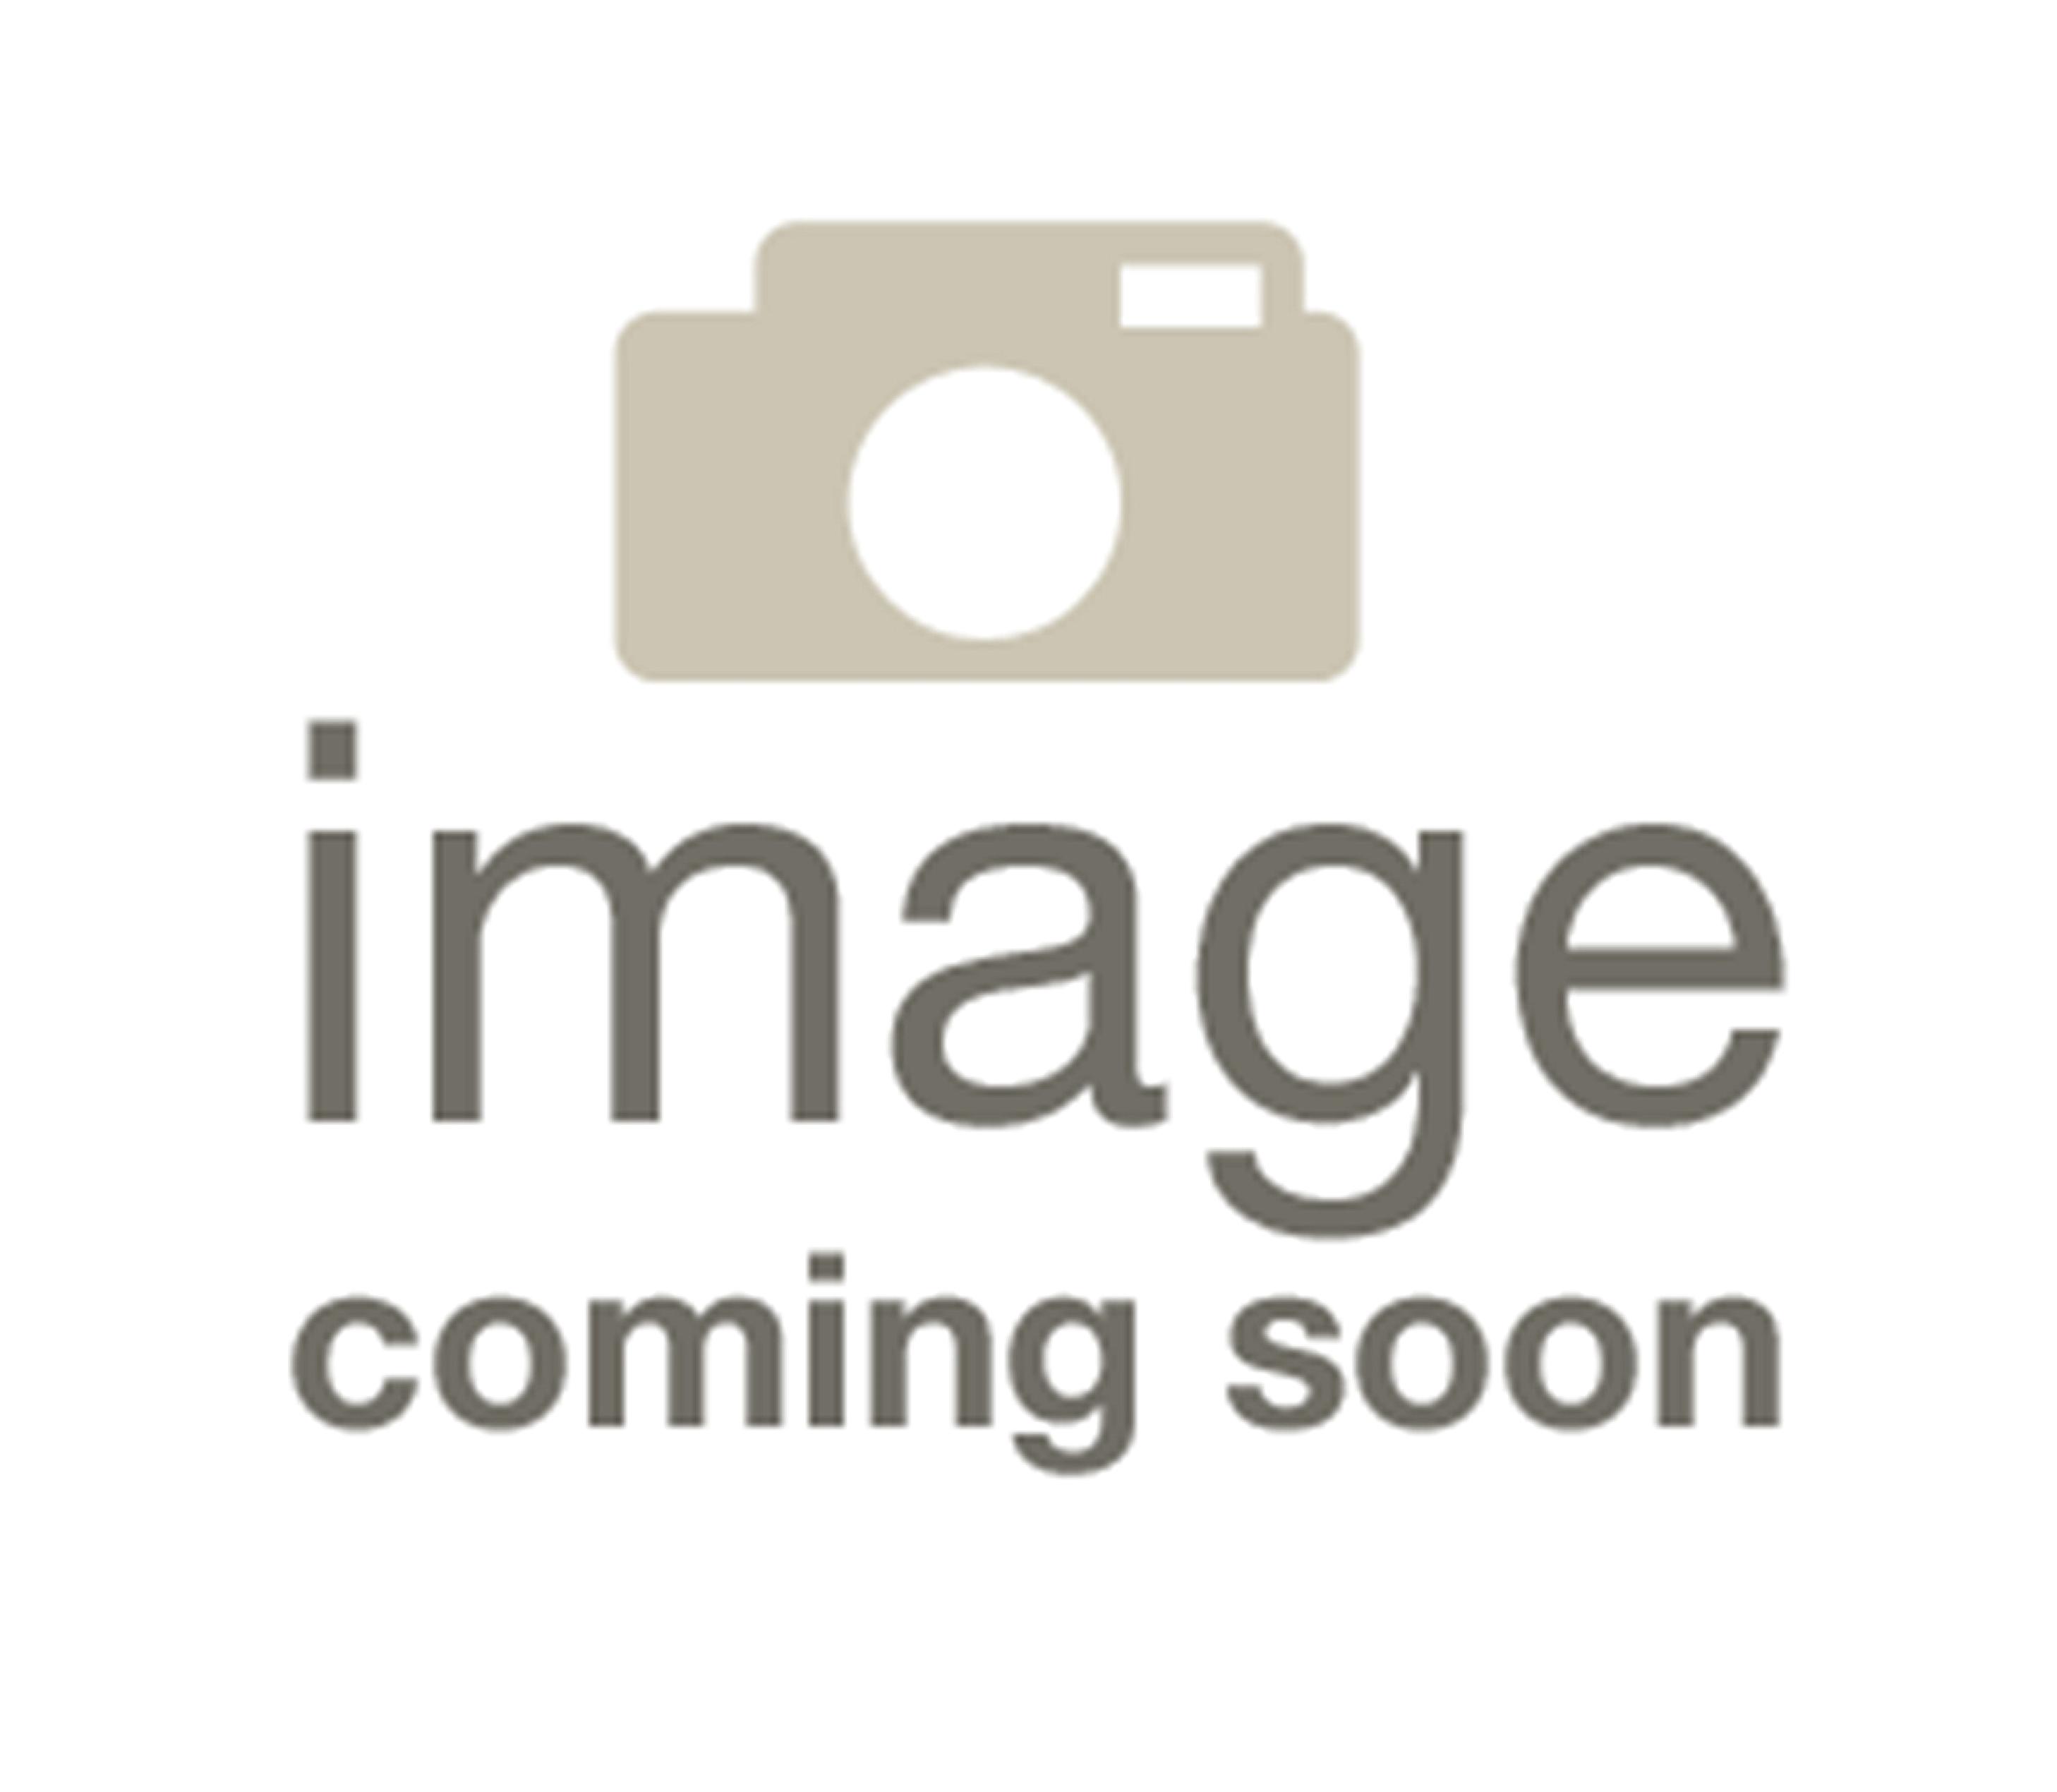 ISX 15 Cummings EGR Delete CM2350 2015-20 Exhaust Only Kit.